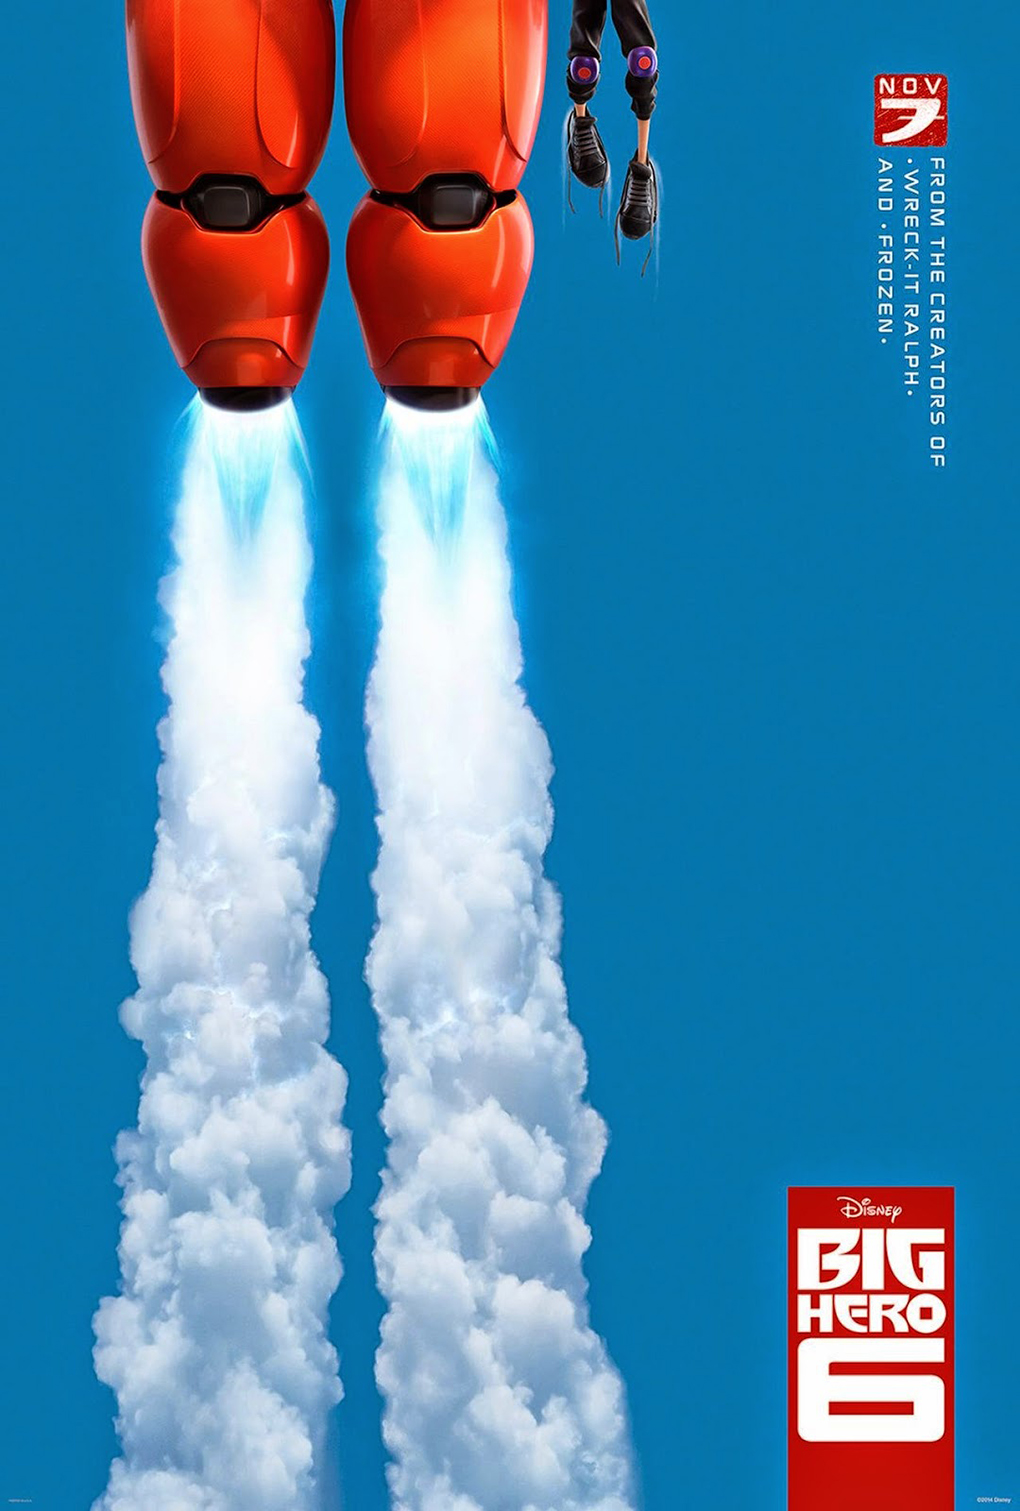 Bighero6_poster1_1020